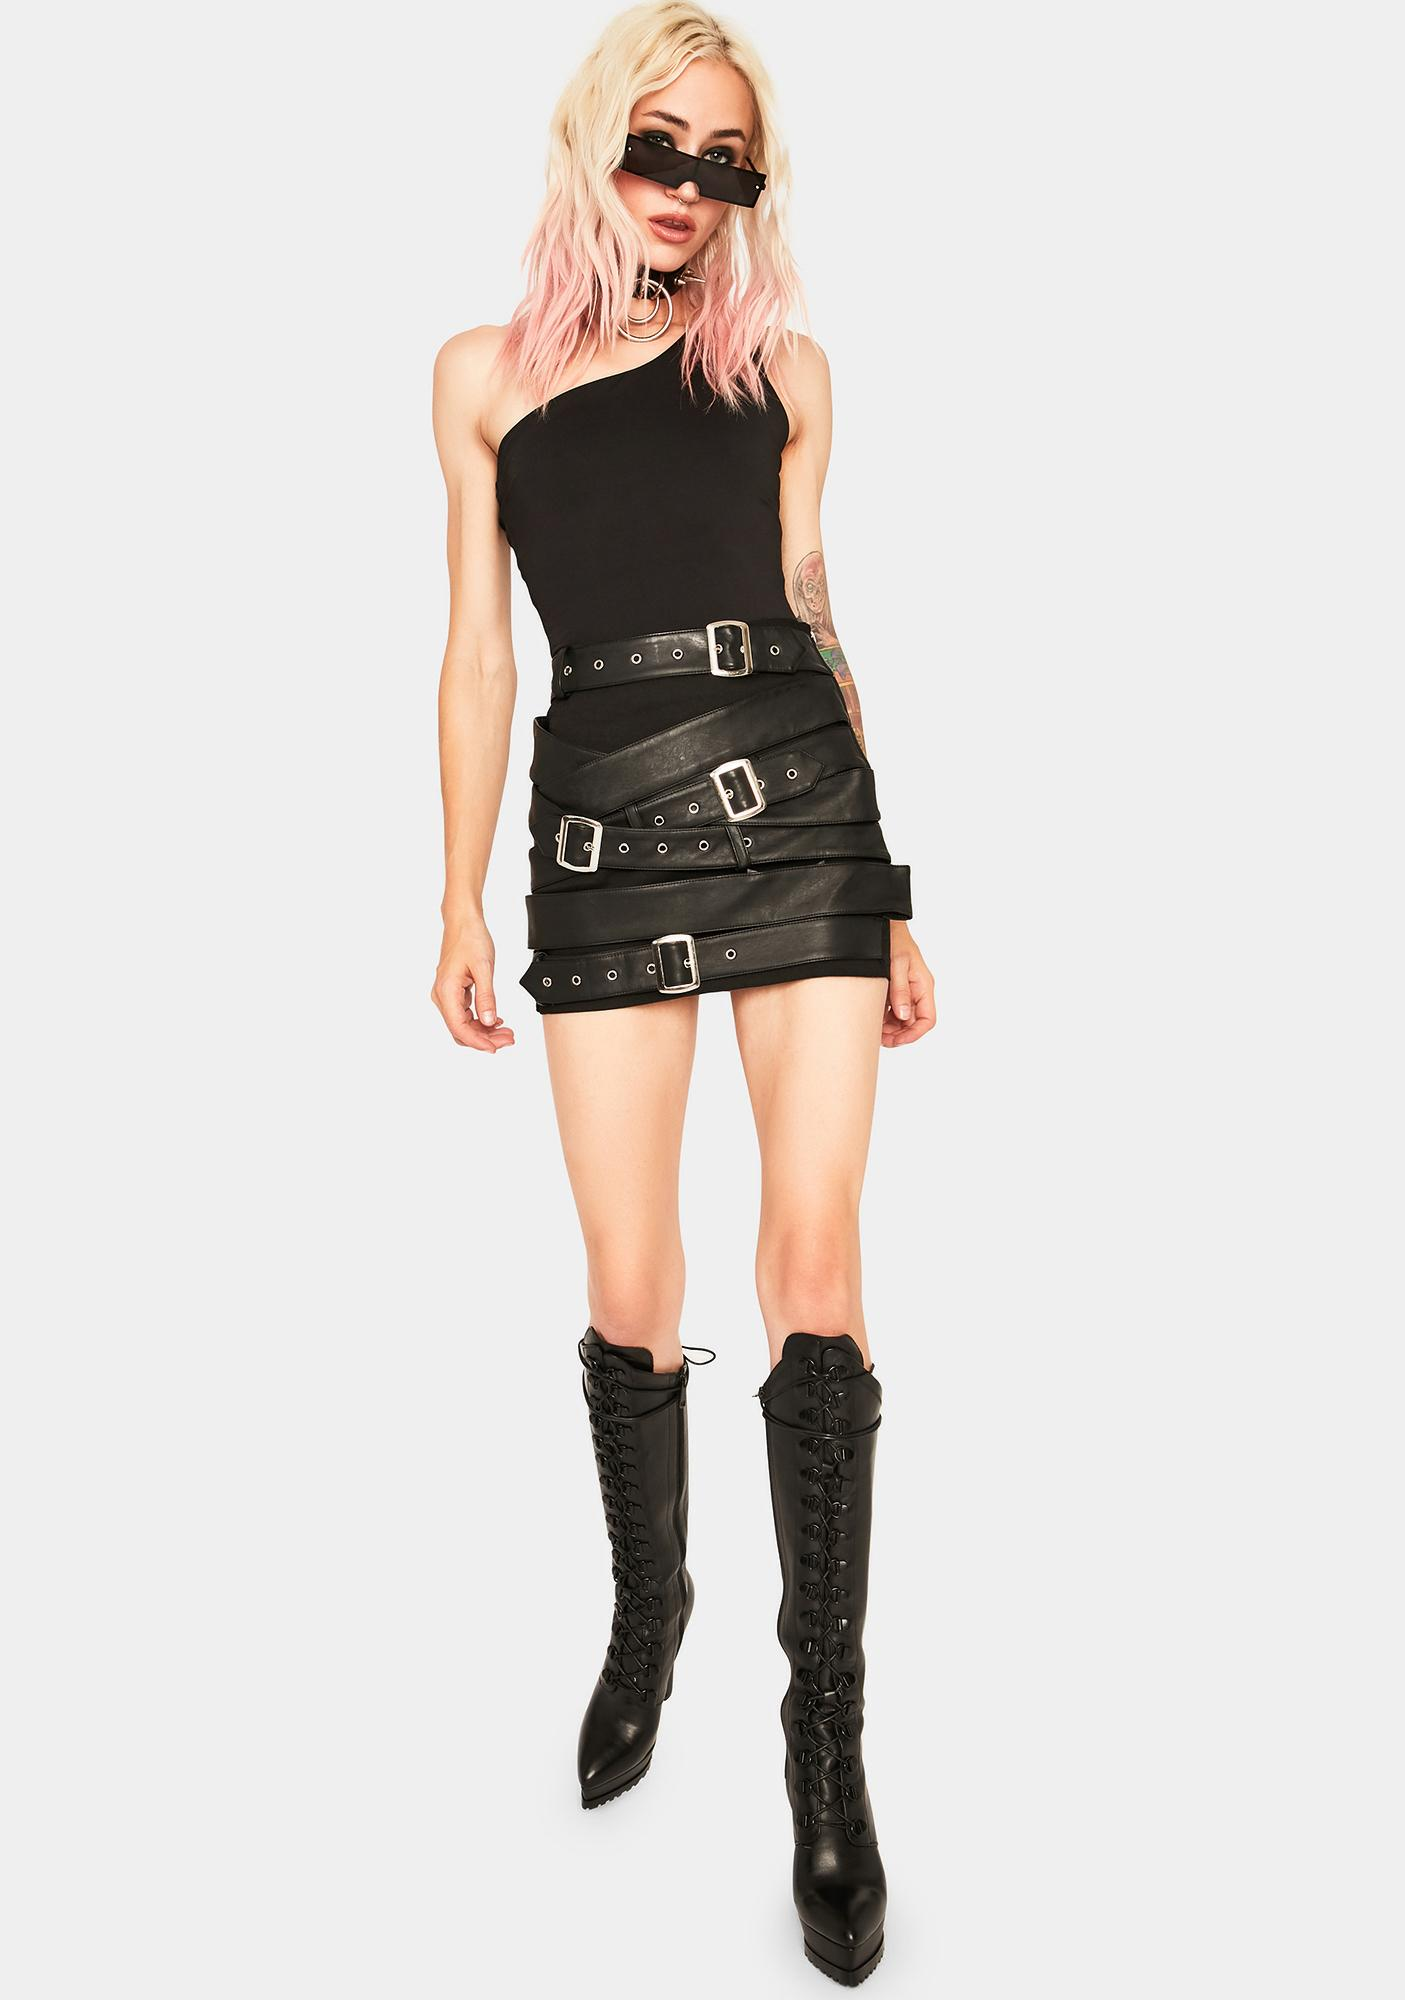 SNDYS. THE LABEL Annie Asymmetrical Bodysuit